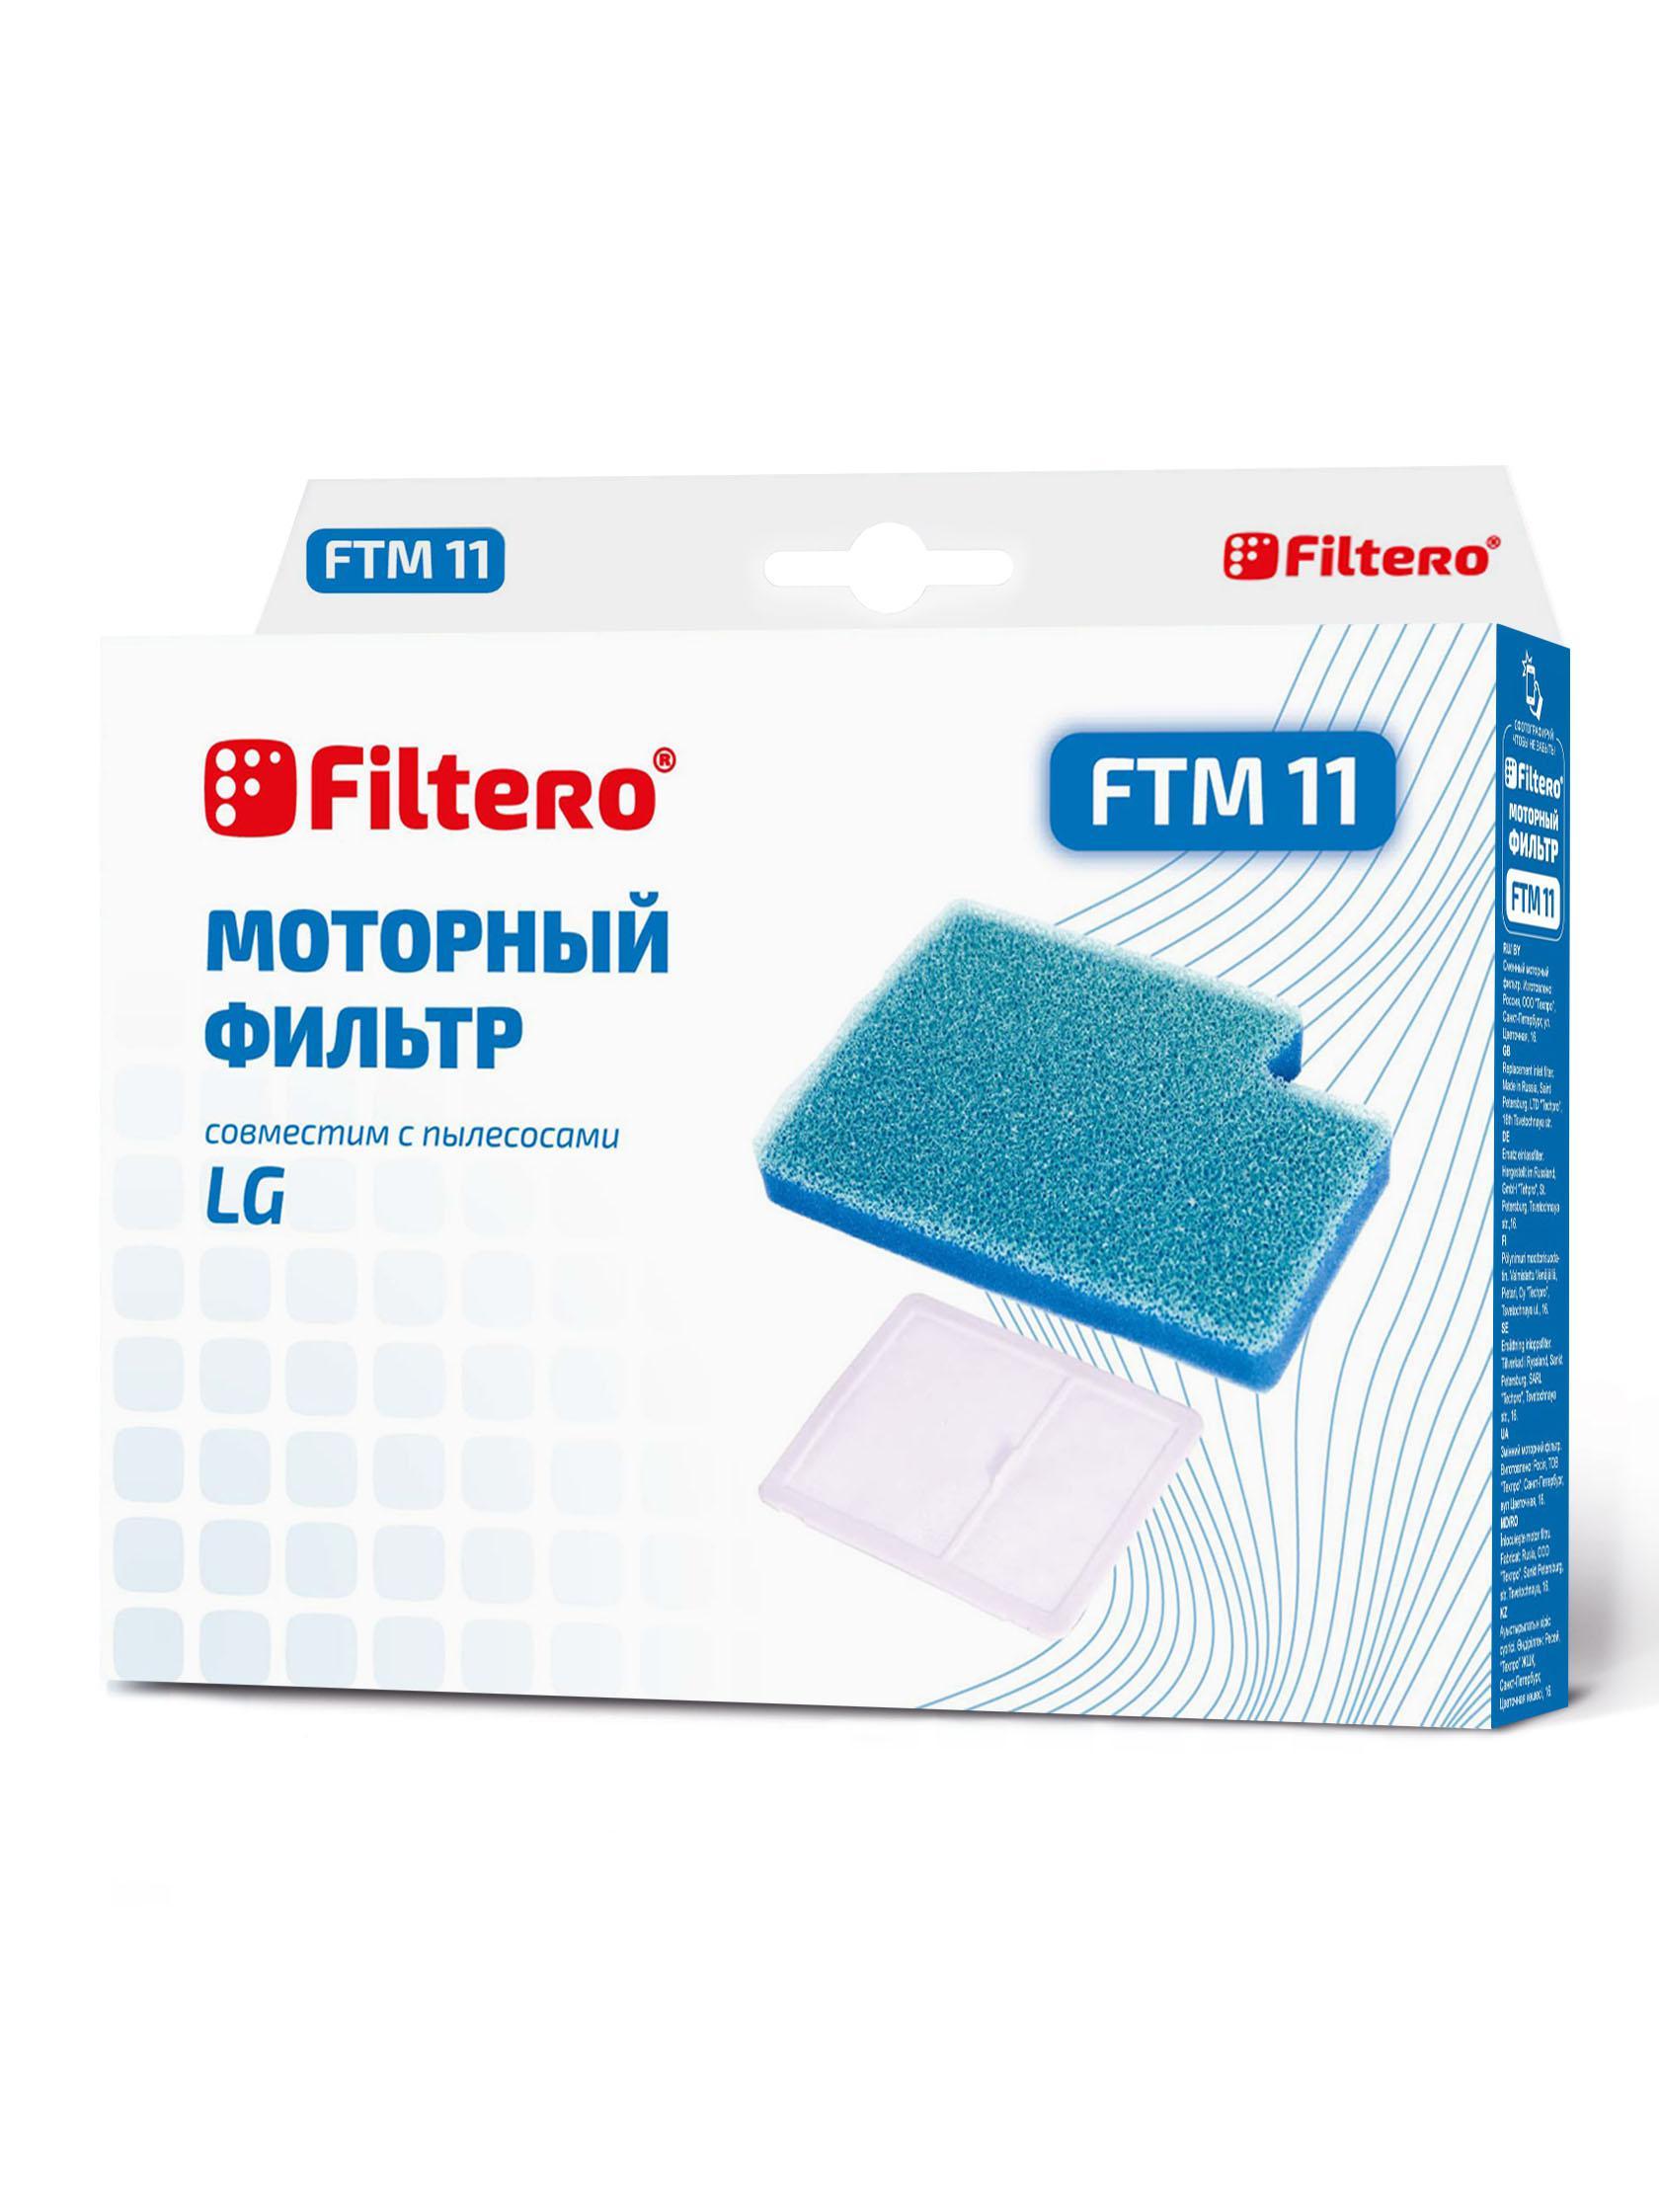 Набор Filtero Ftm 11 lge пылесборник для пылесоса filtero lge 02 5 standard lge 02 5 standard